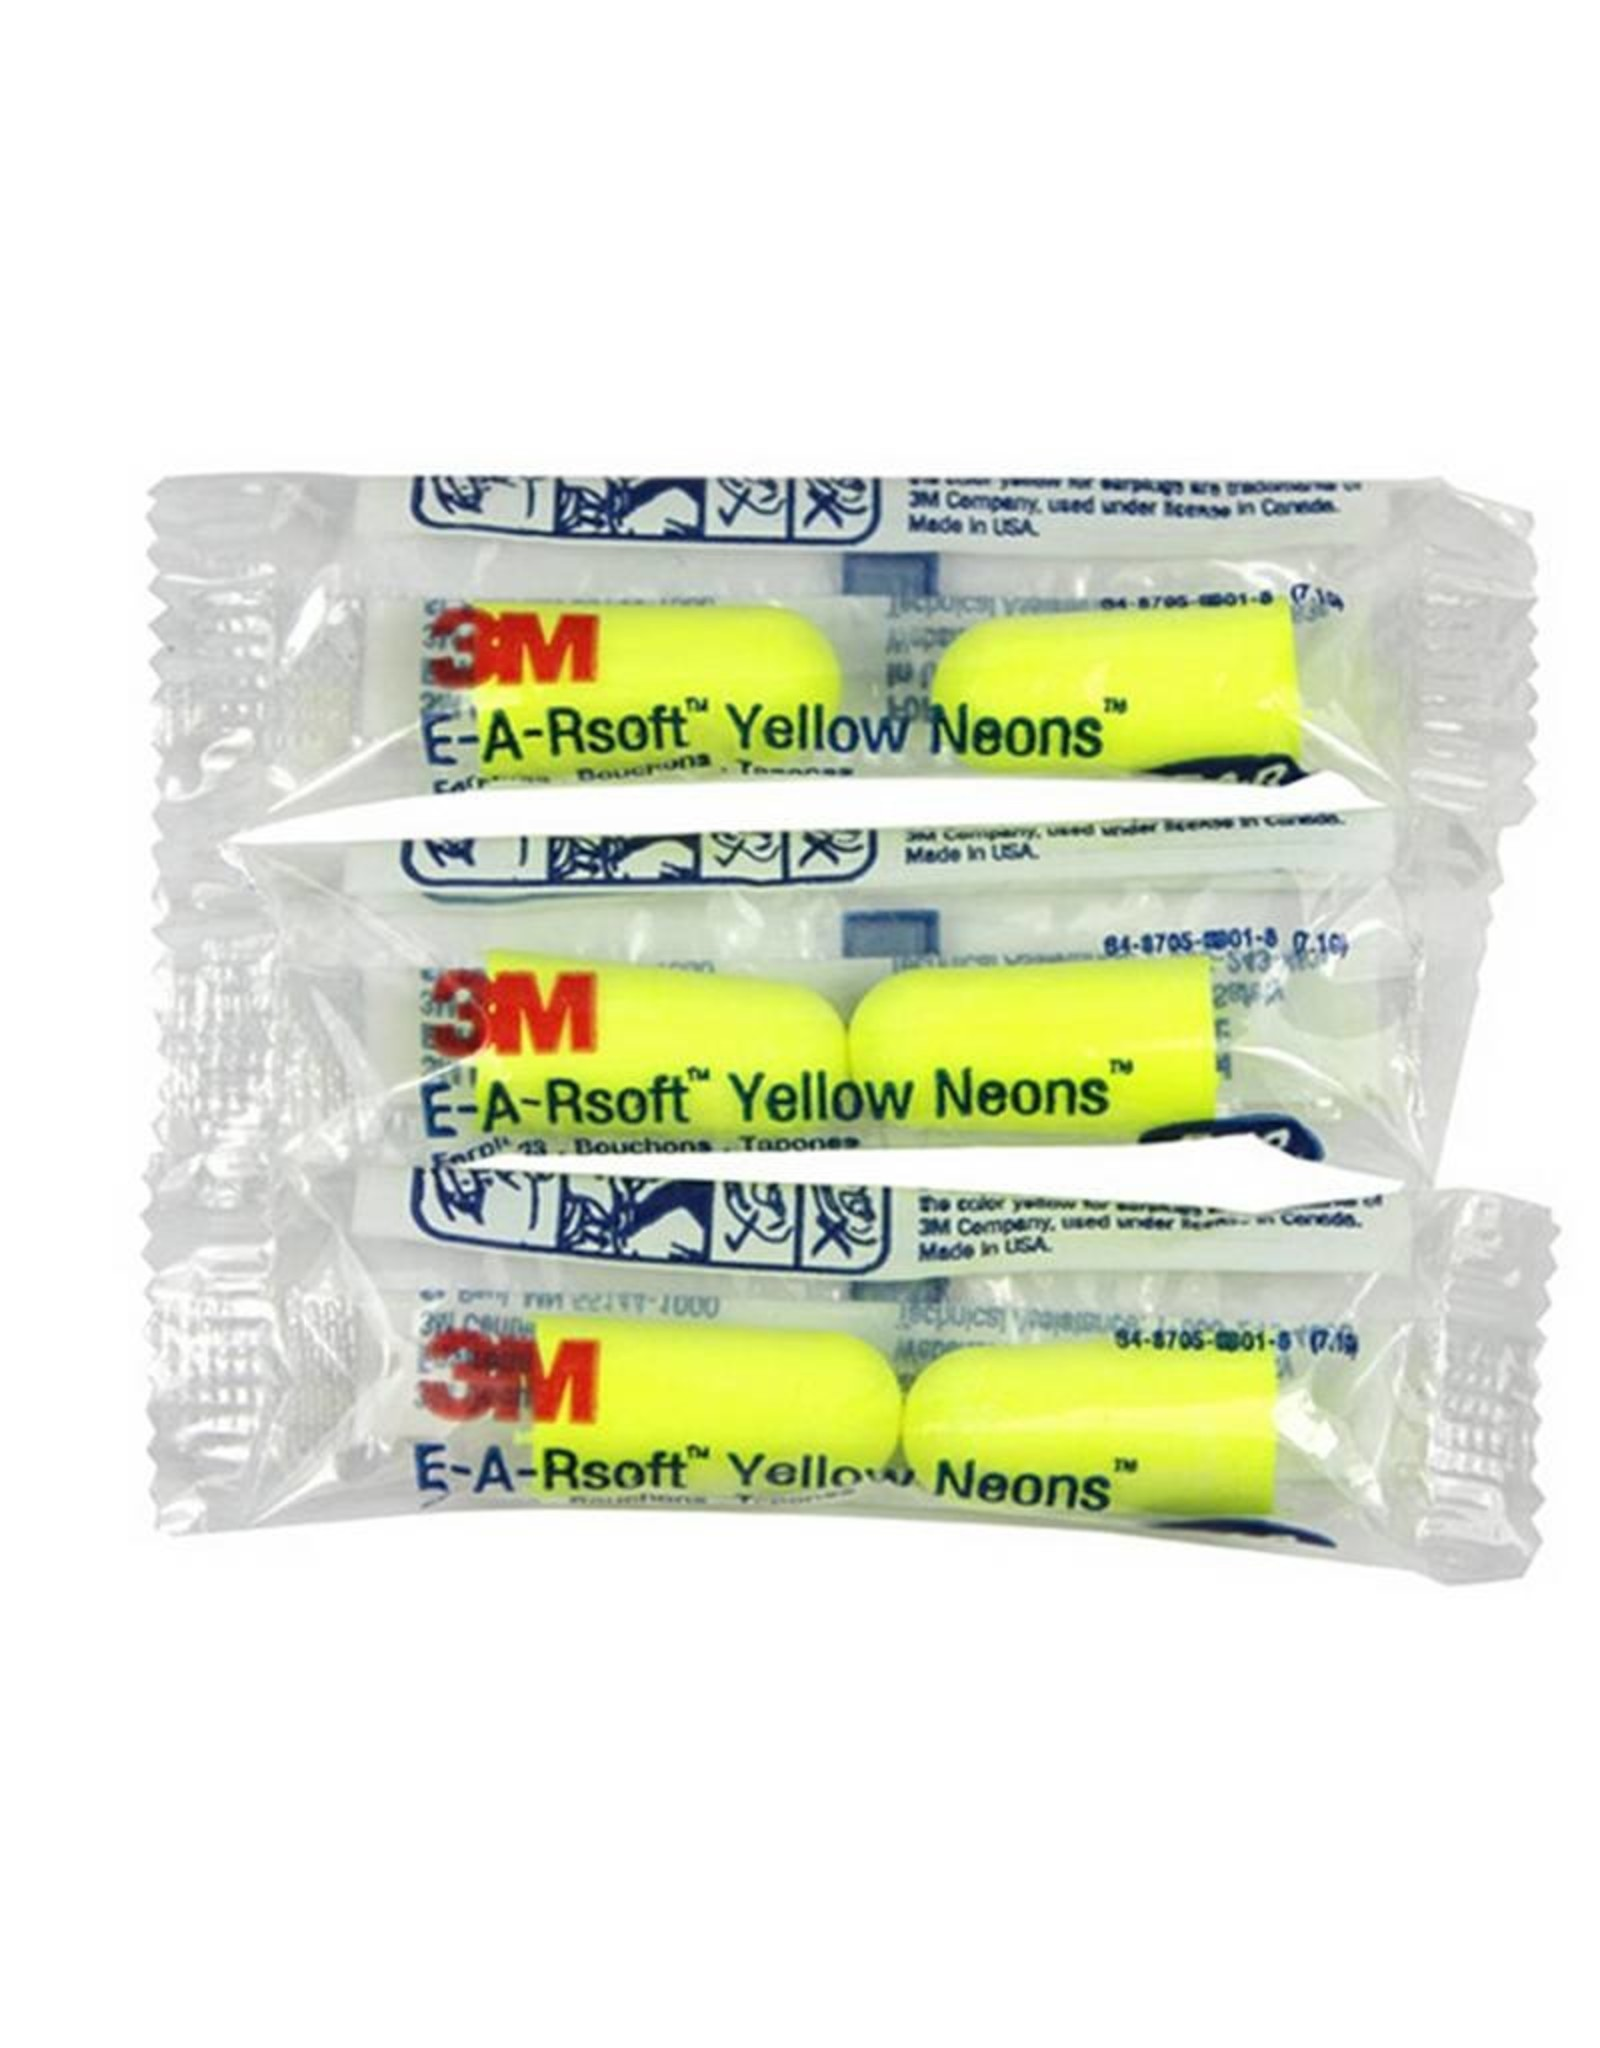 3M EARsoft Yellow Neons Uncorded Earplugs, in Poly Bag ..Regular Size